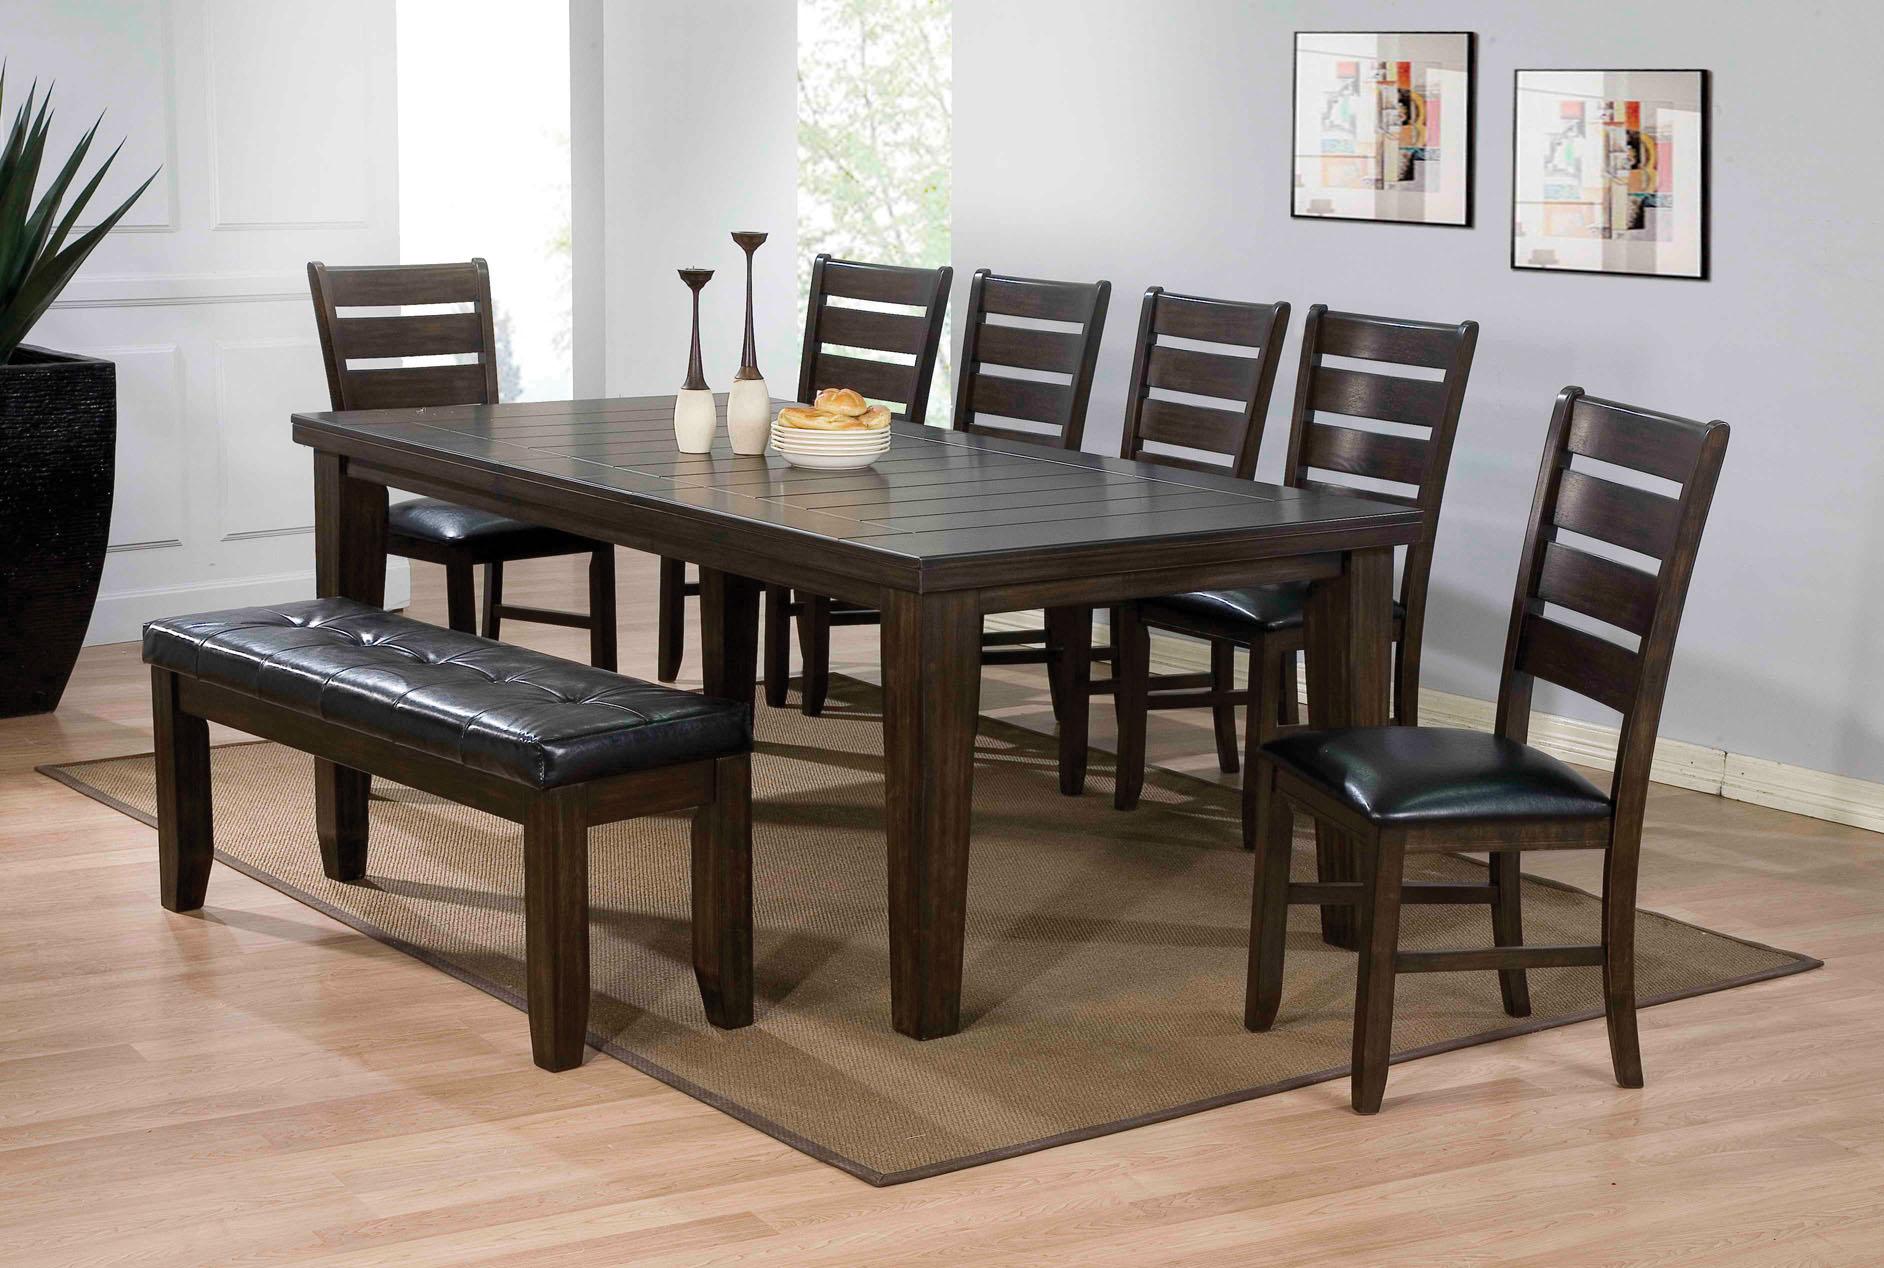 "42"" X 48-66"" Espresso Dining Table"